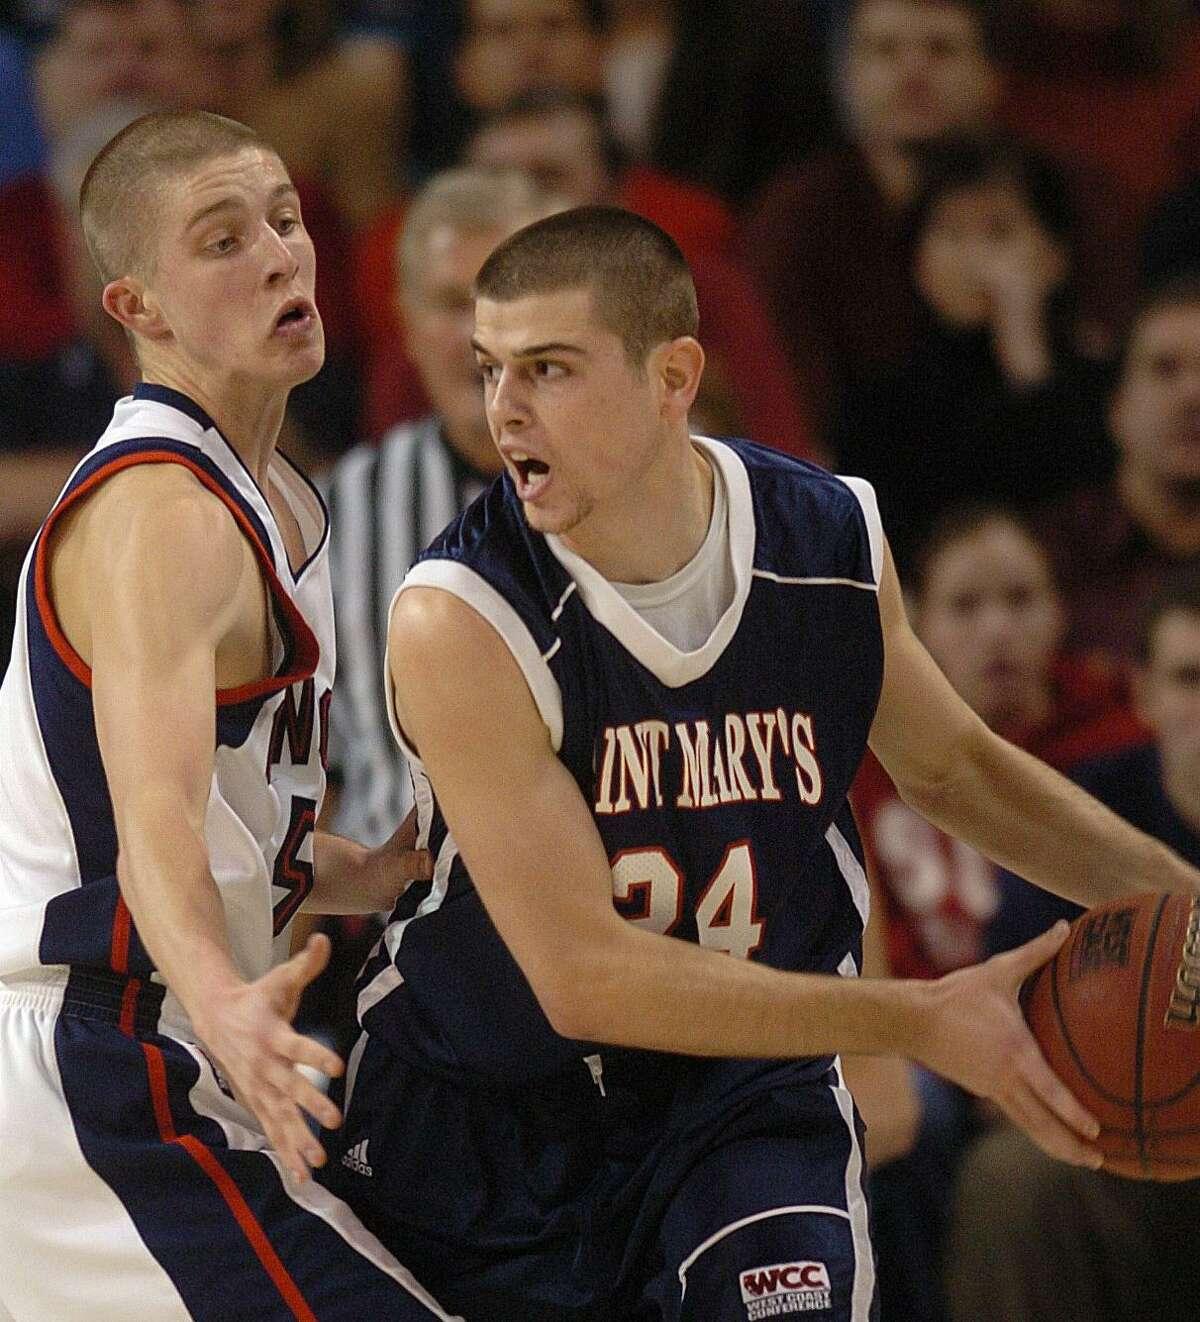 Gonzaga's Derek Ravio blocks Saint Mary's Todd Golden, right, during their college basketball game Monday Feb. 6, 2006, at the McCarthy Center in Spokane, Wash.